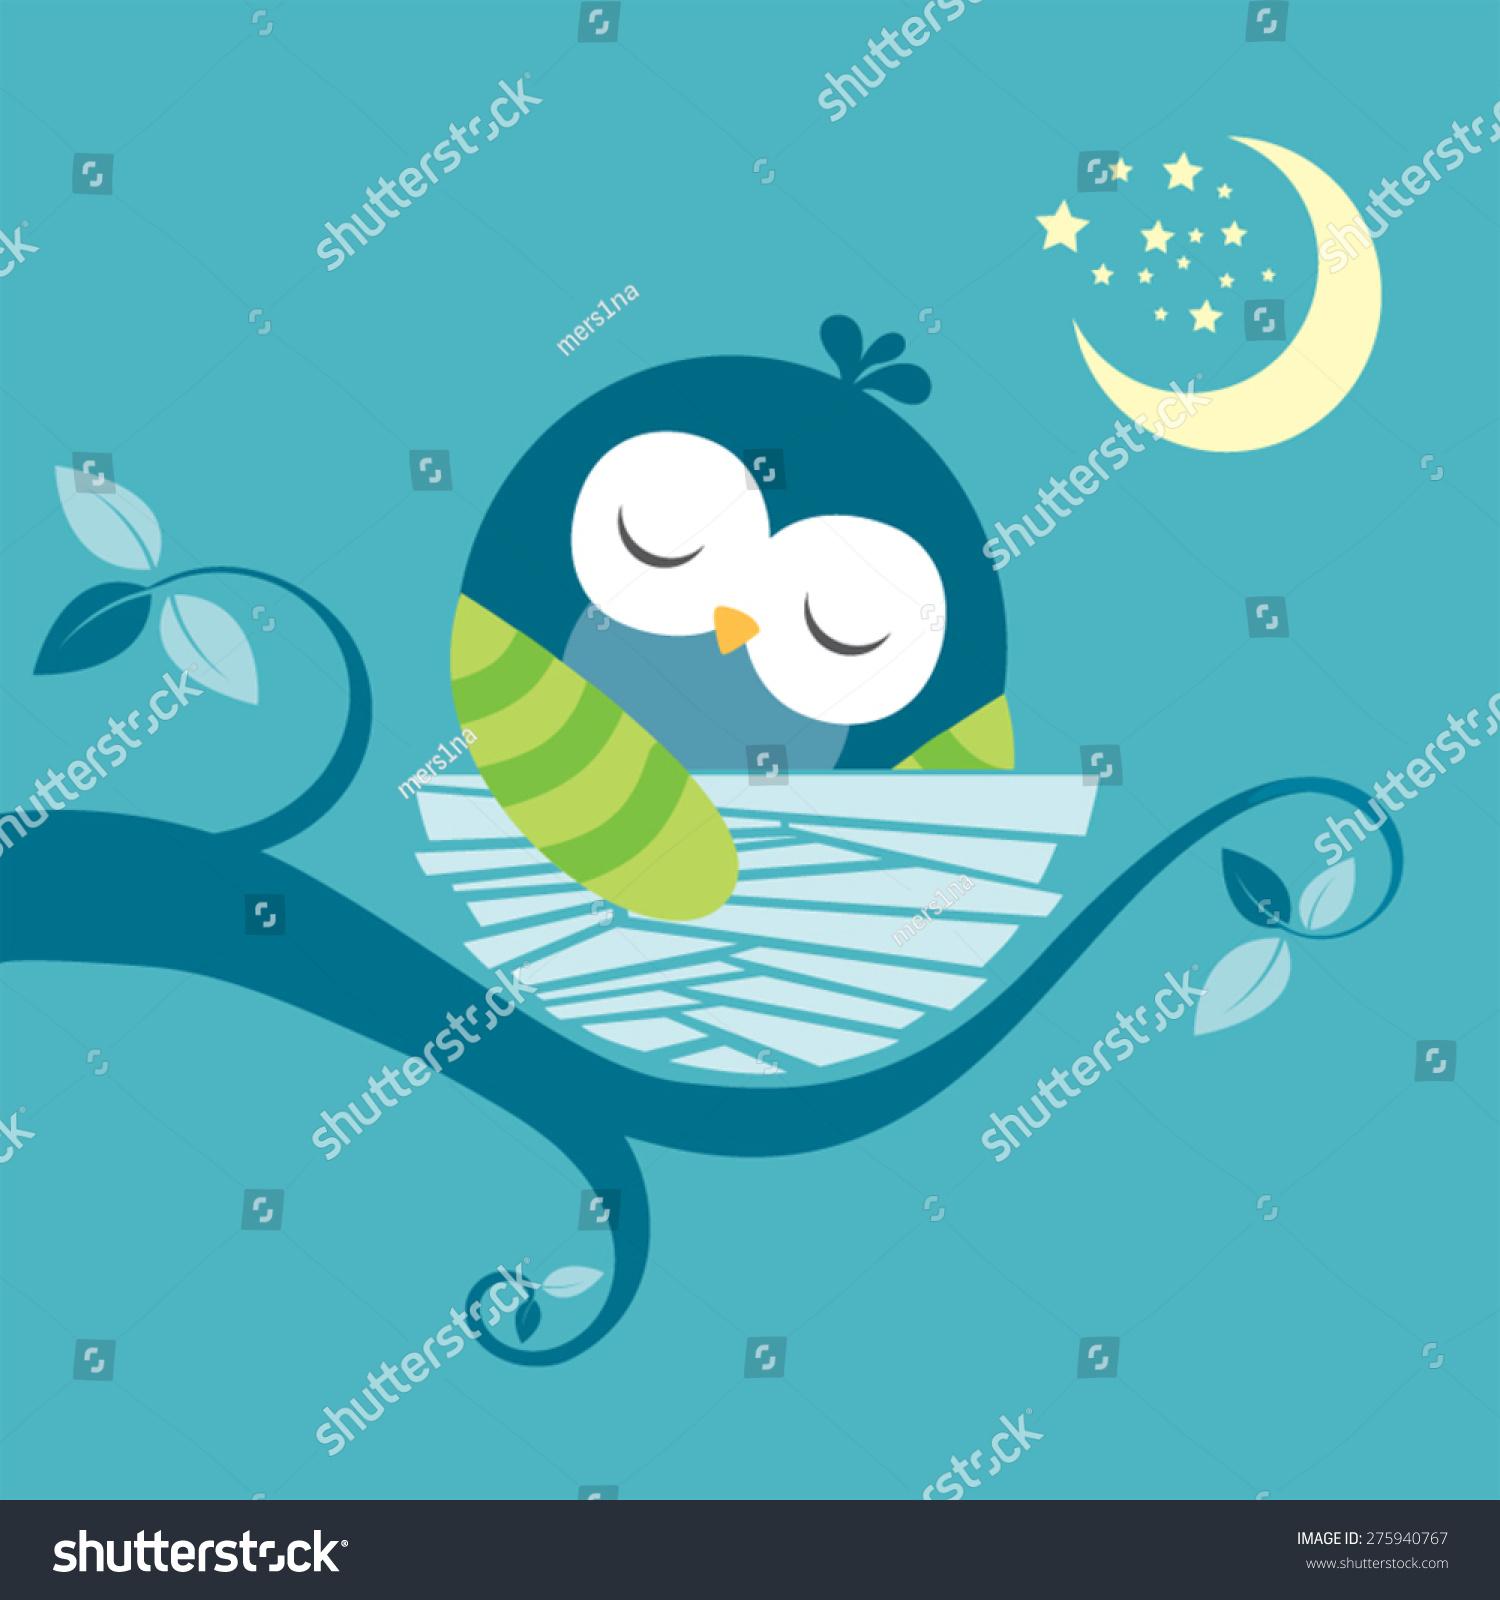 Cute Sleeping Baby Owl Vector Image Stock Vector Royalty Free 275940767